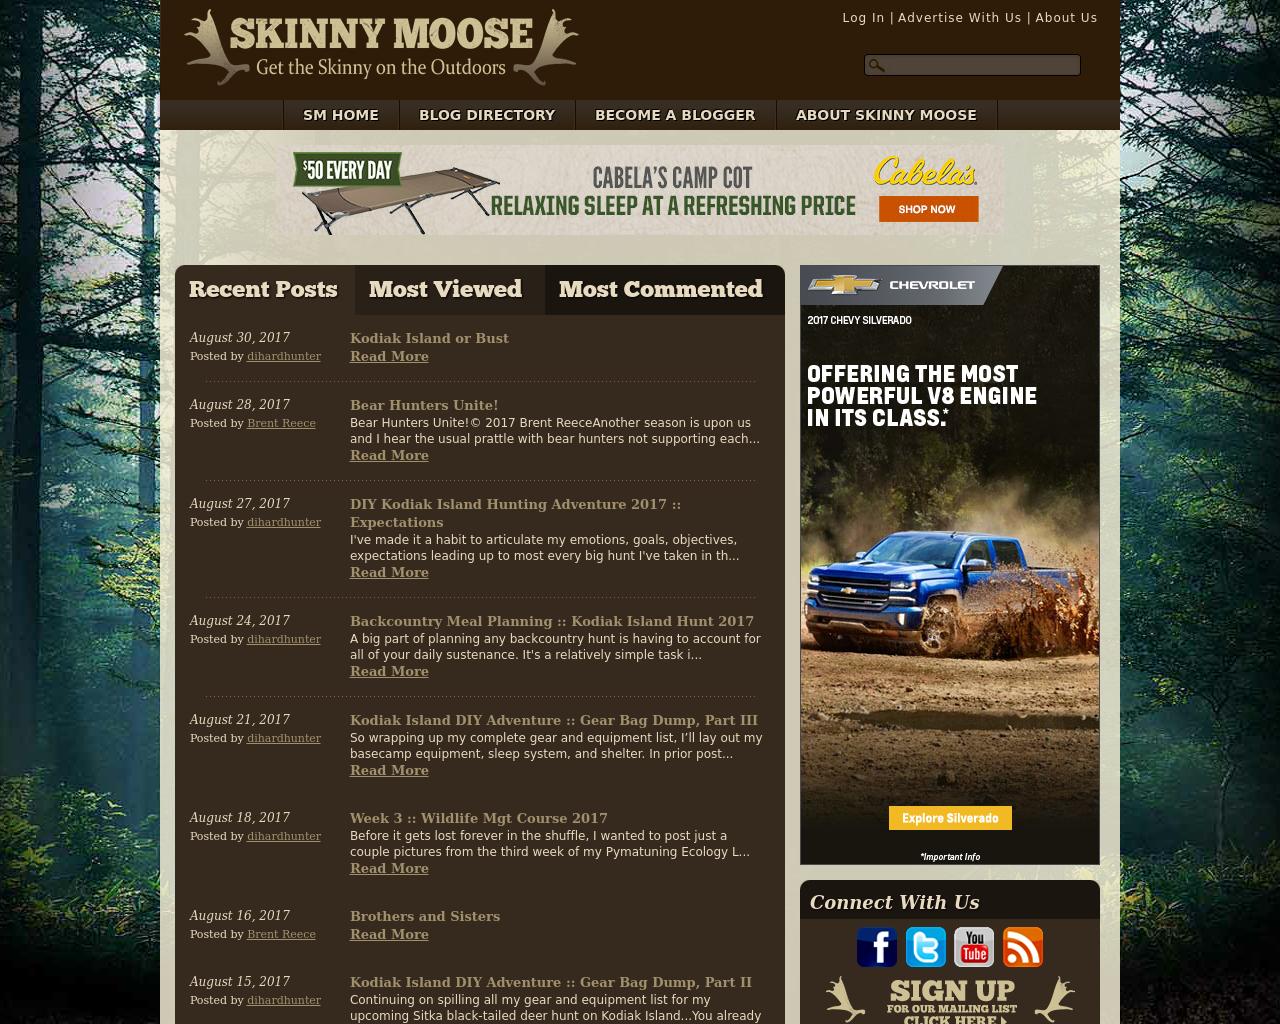 Skinny-Moose-Advertising-Reviews-Pricing